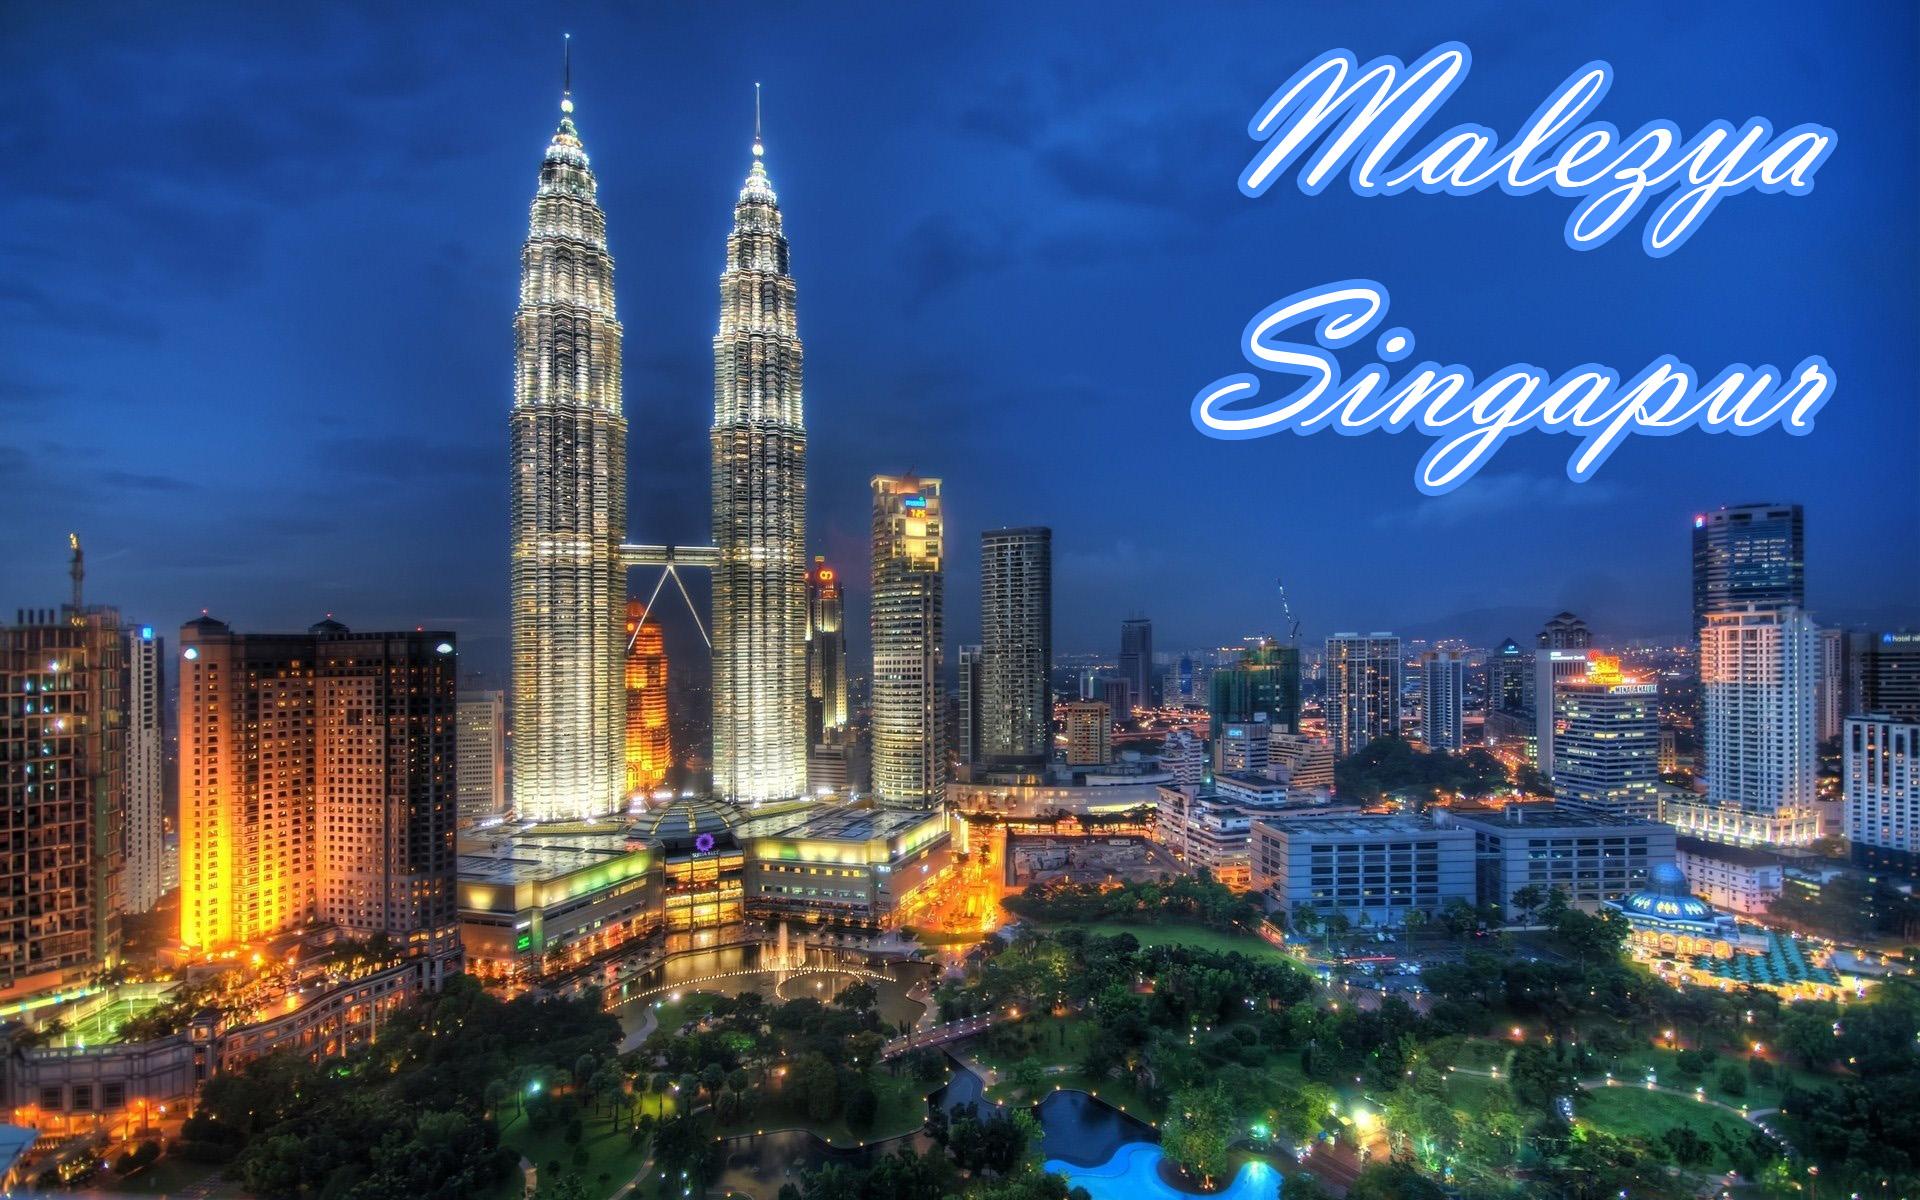 Malezya - Singapur Turu